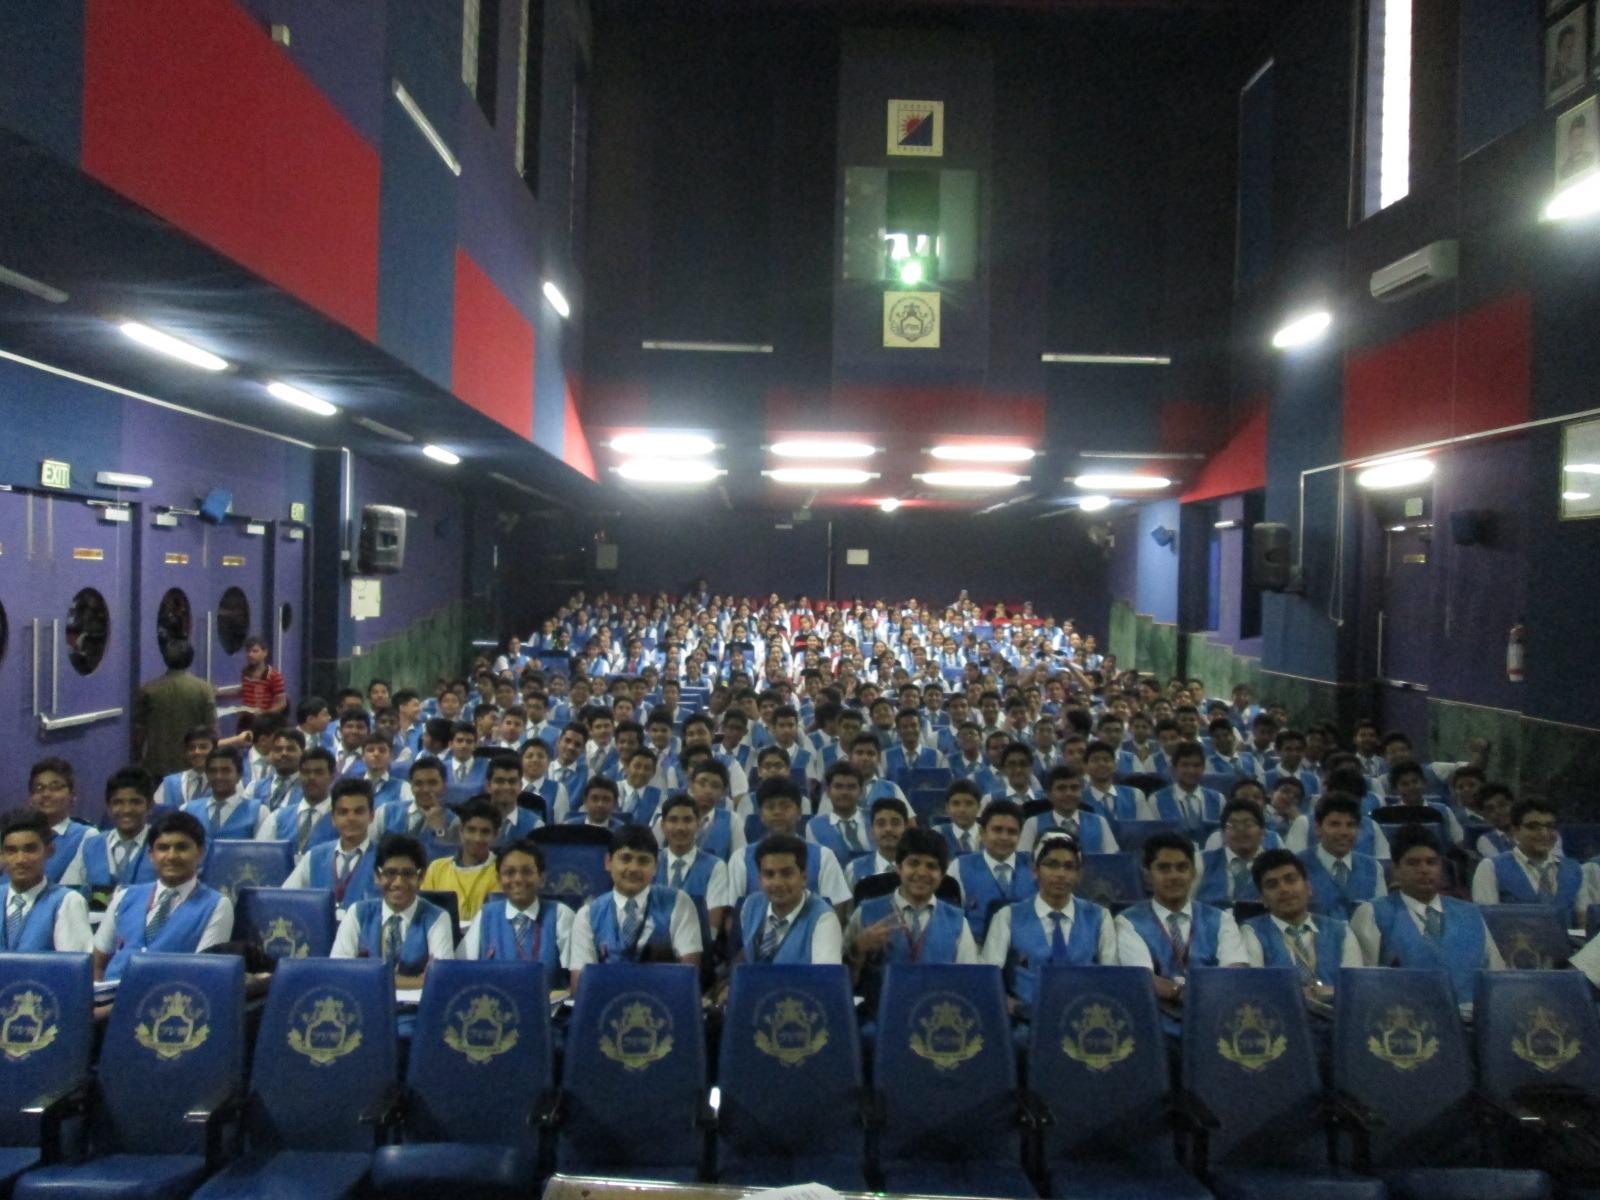 Thakur Vidyamandir School, INDIA